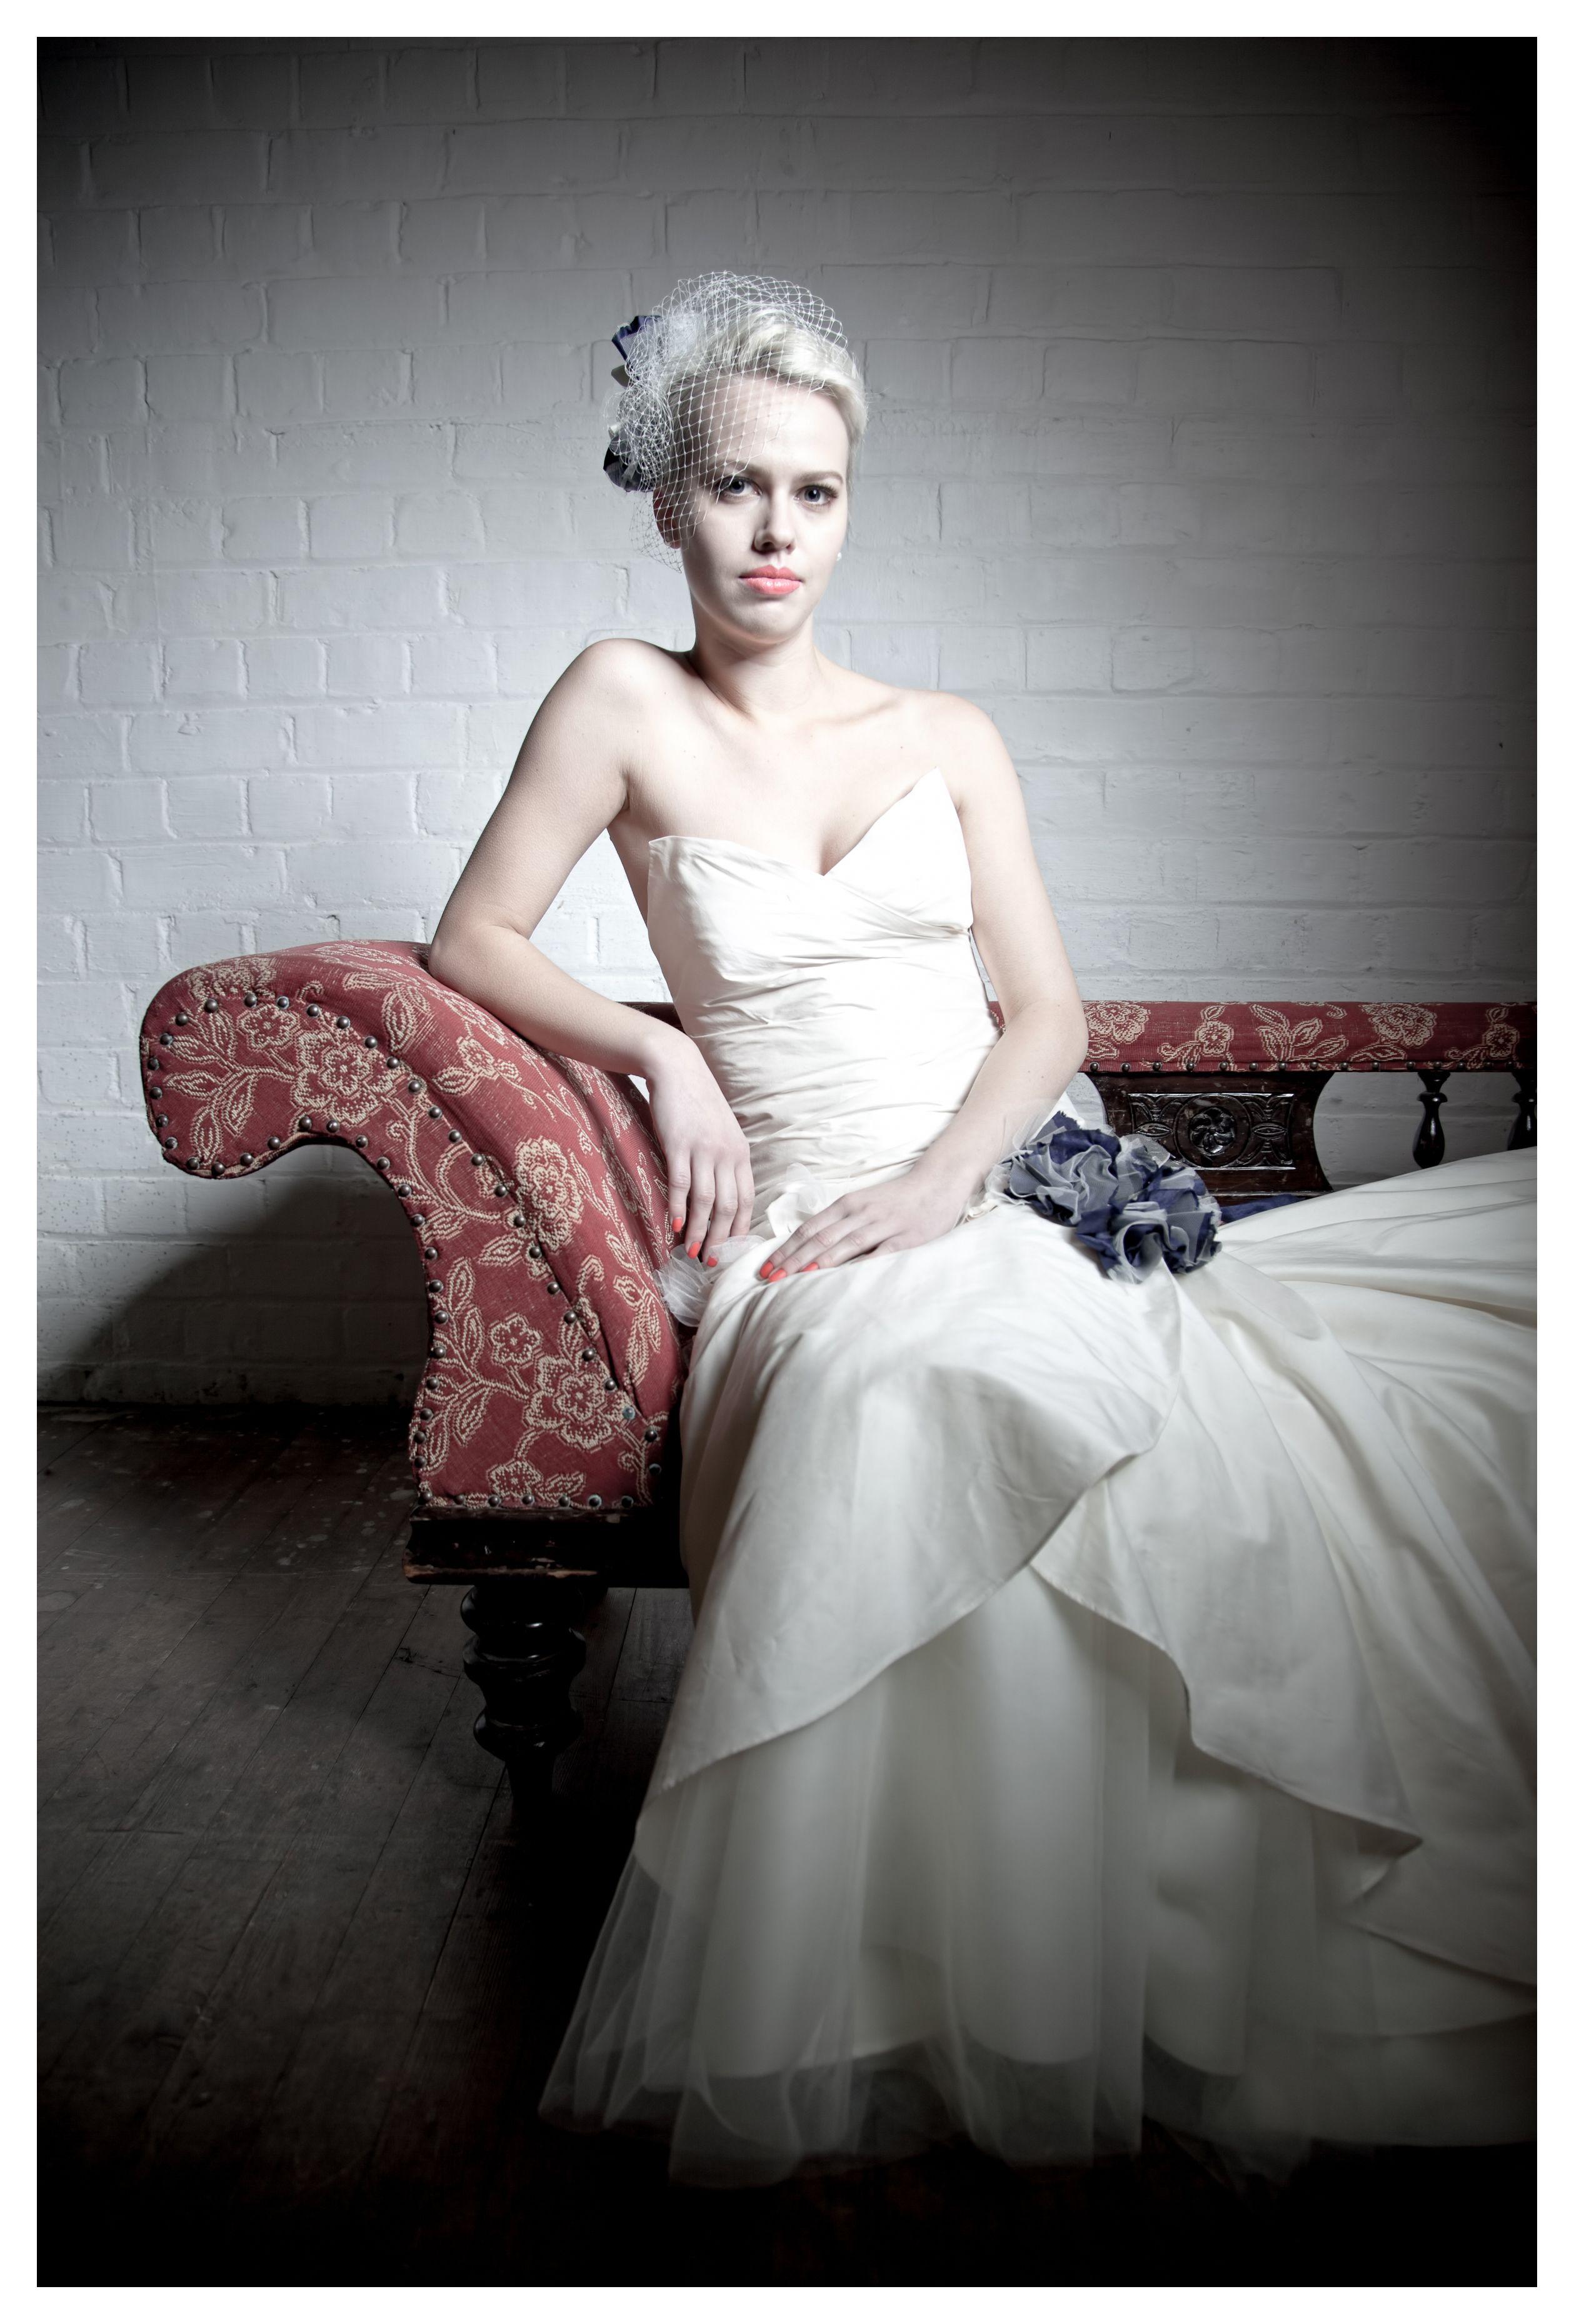 Gemma Sargent Essence Bridal Gown and Birdcage Veil. Designed and ...